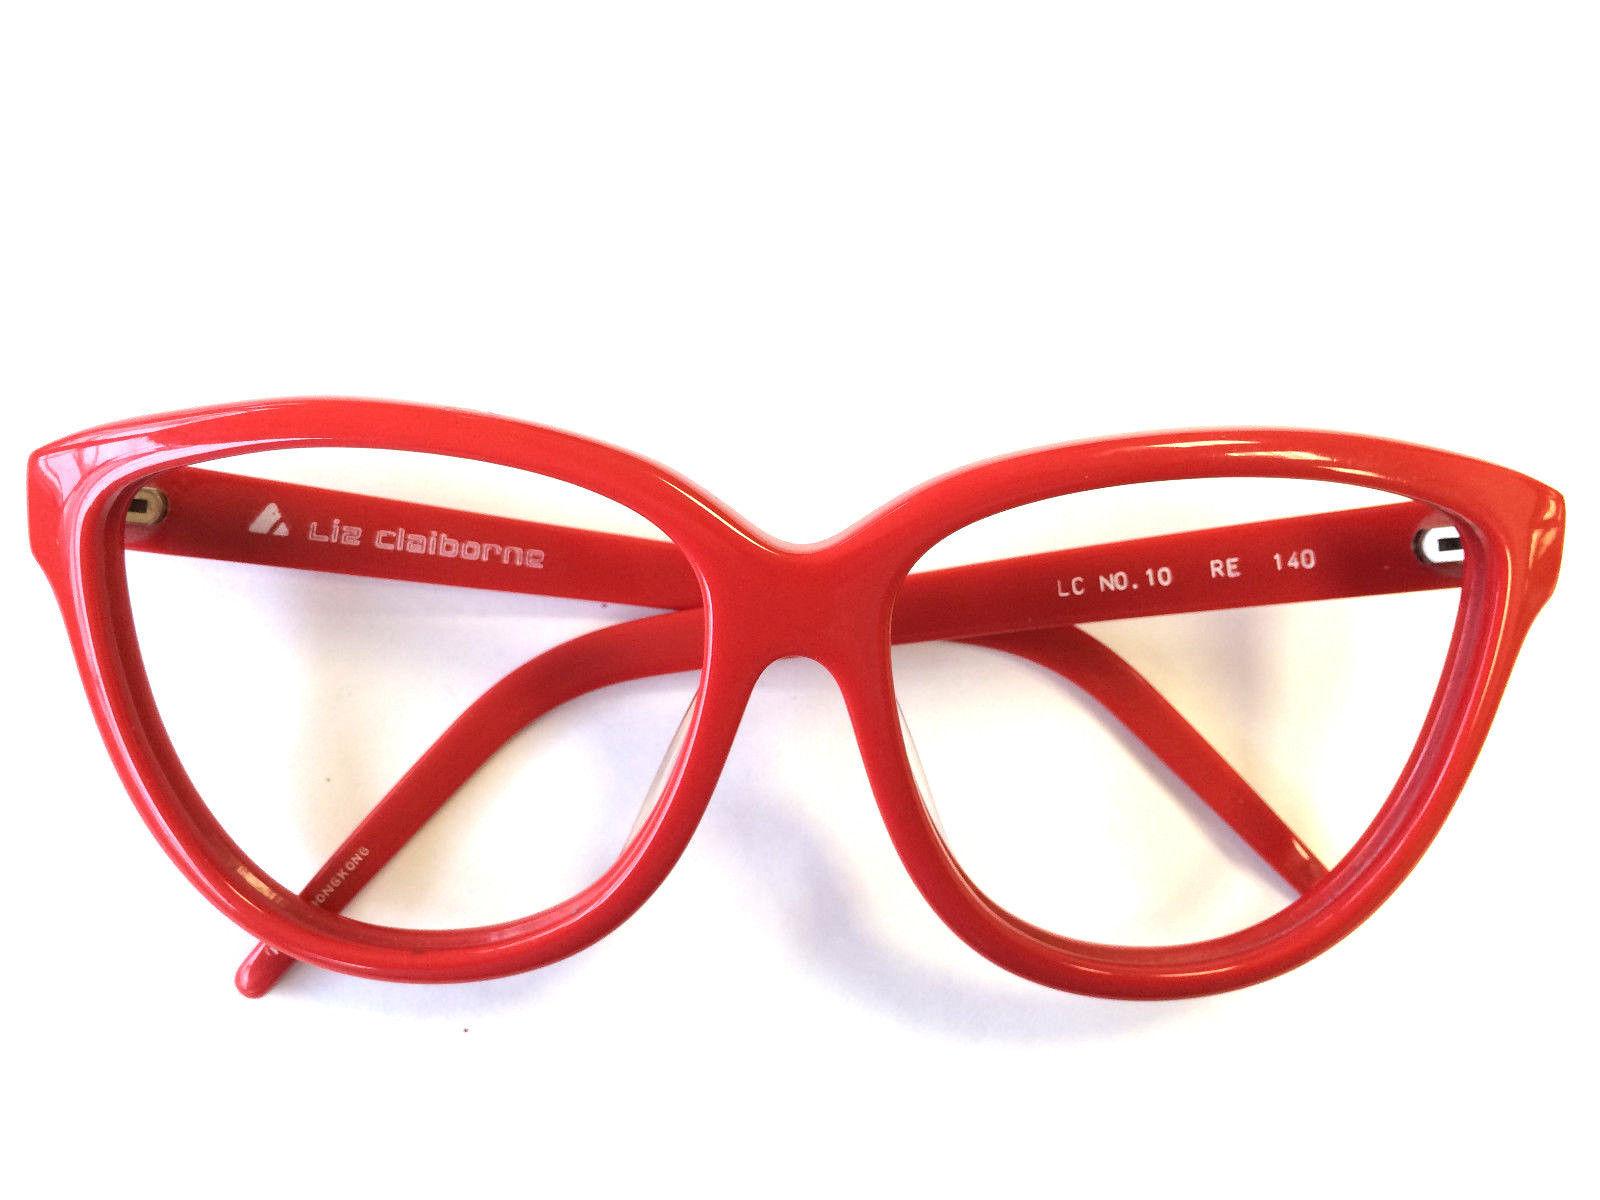 Liz Claiborne Eyeglasses Vintage LC No.10 Eyeglass Frame ...